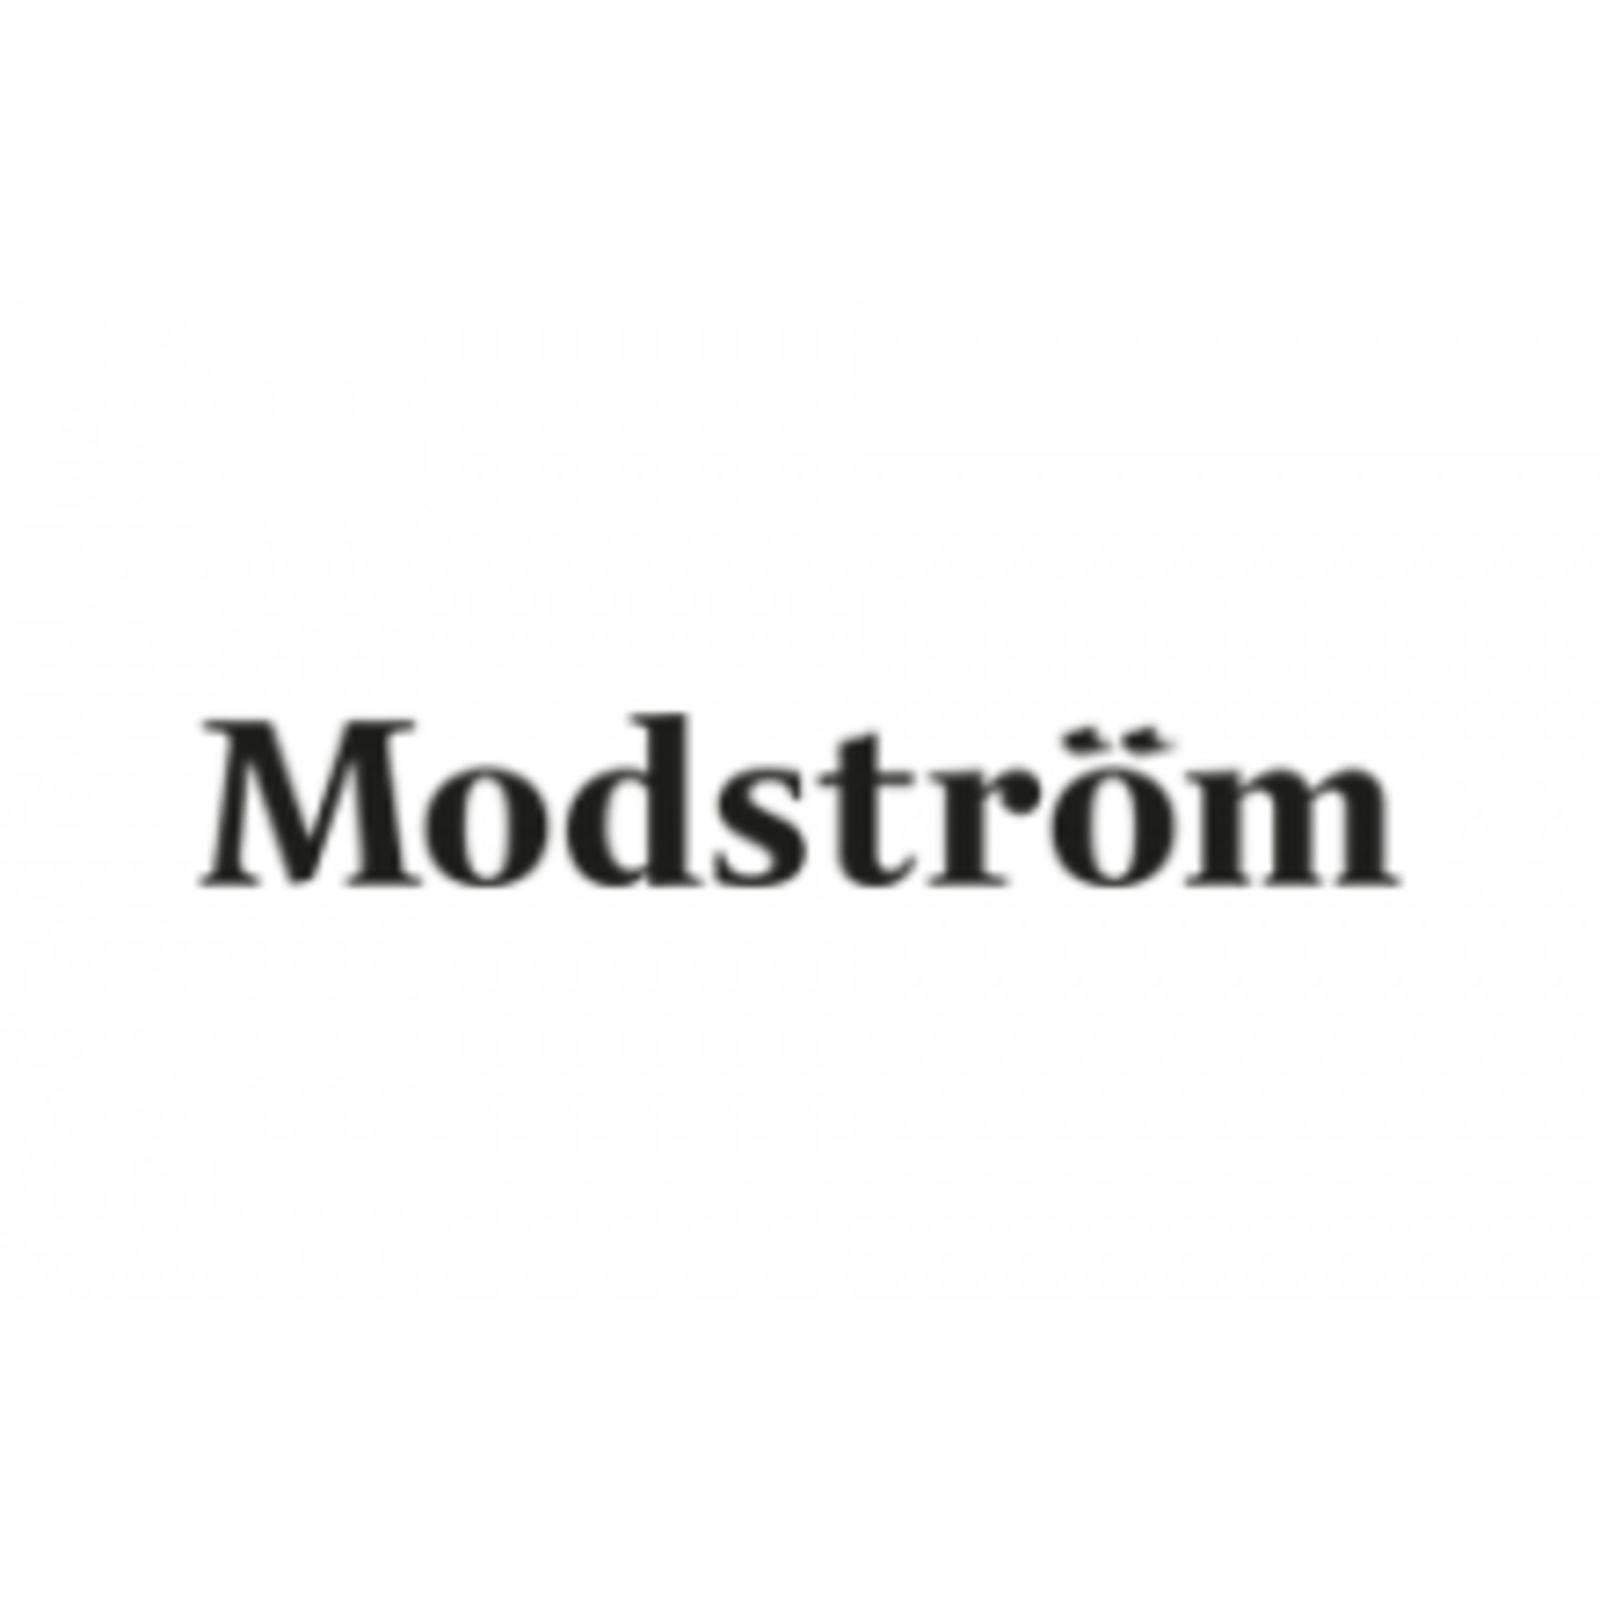 modström (Bild 1)